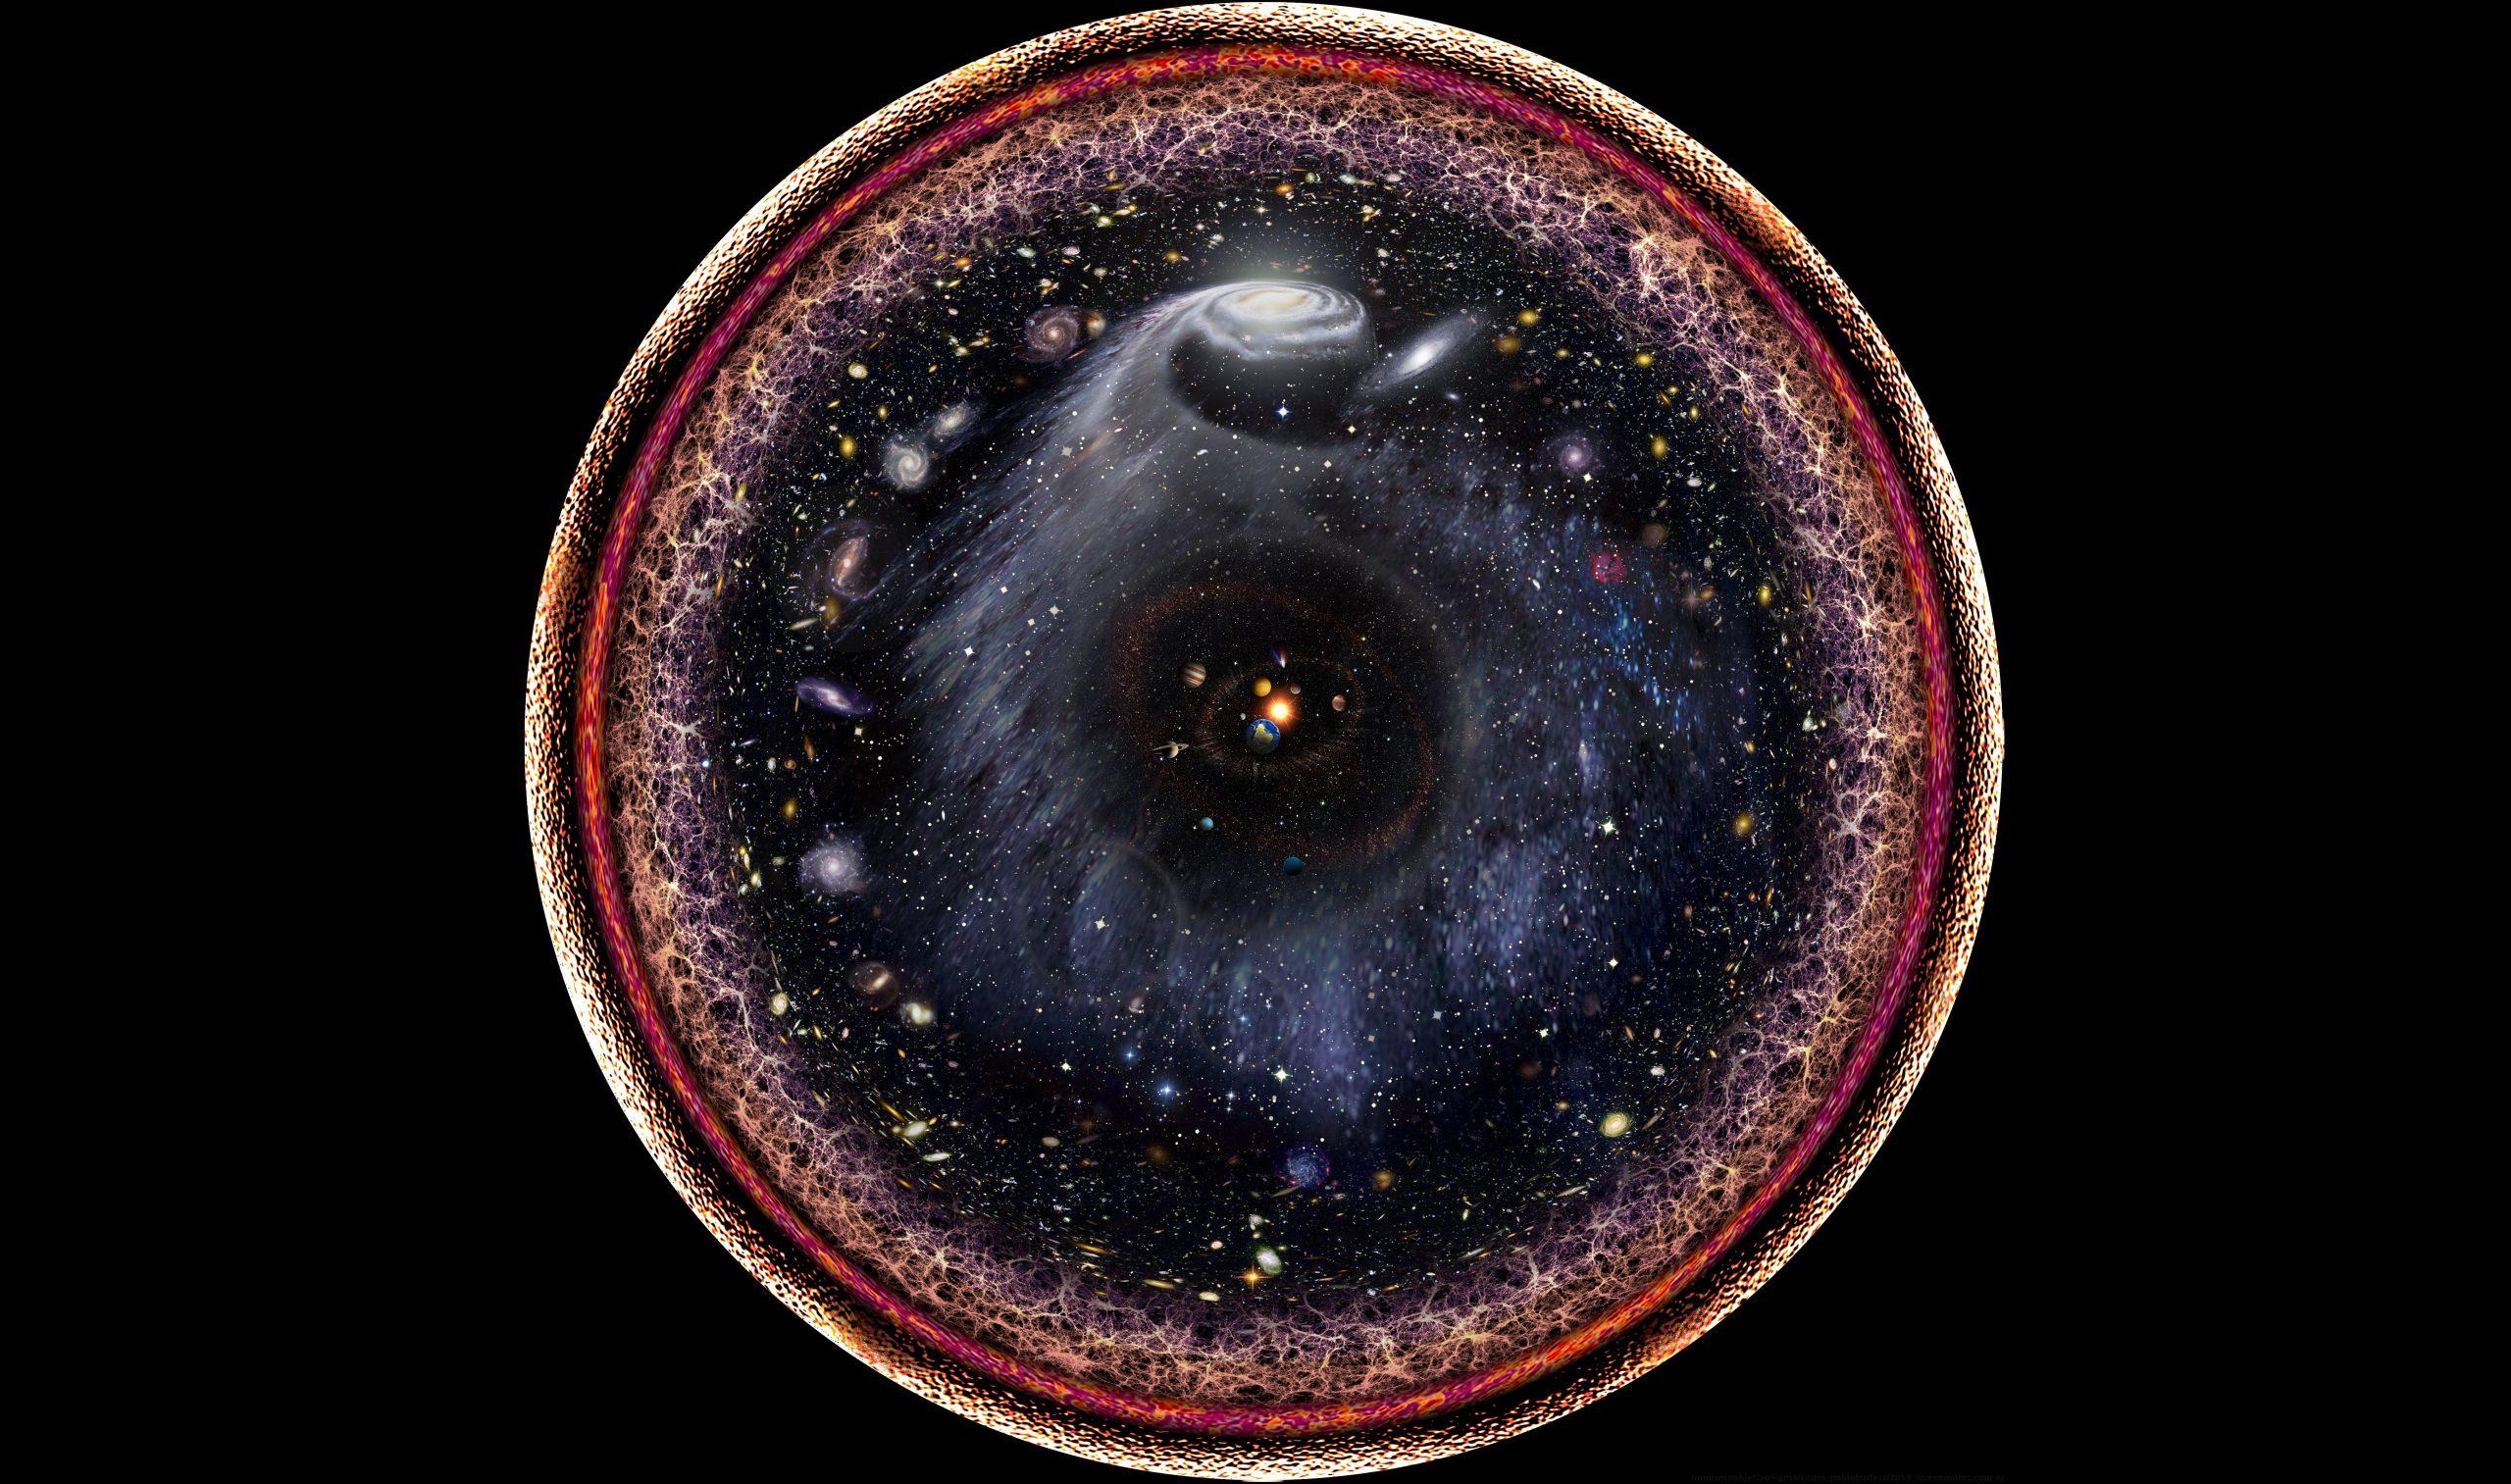 Logaritamska radijalna slika svemira. Izvor: Wikimedia Commons.